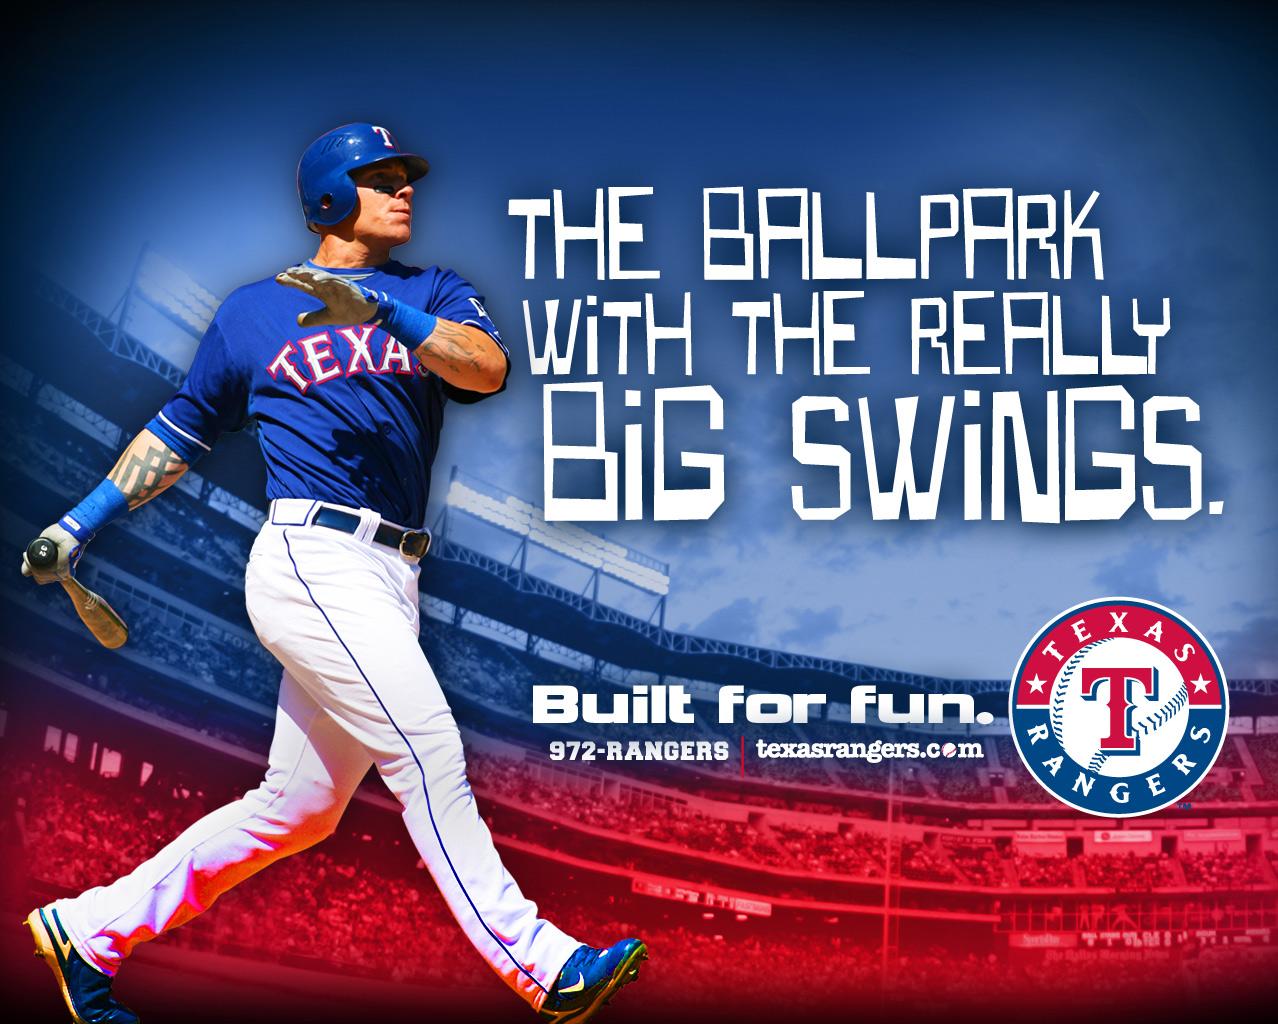 Texas Rangers wallpapers Texas Rangers background 1278x1024